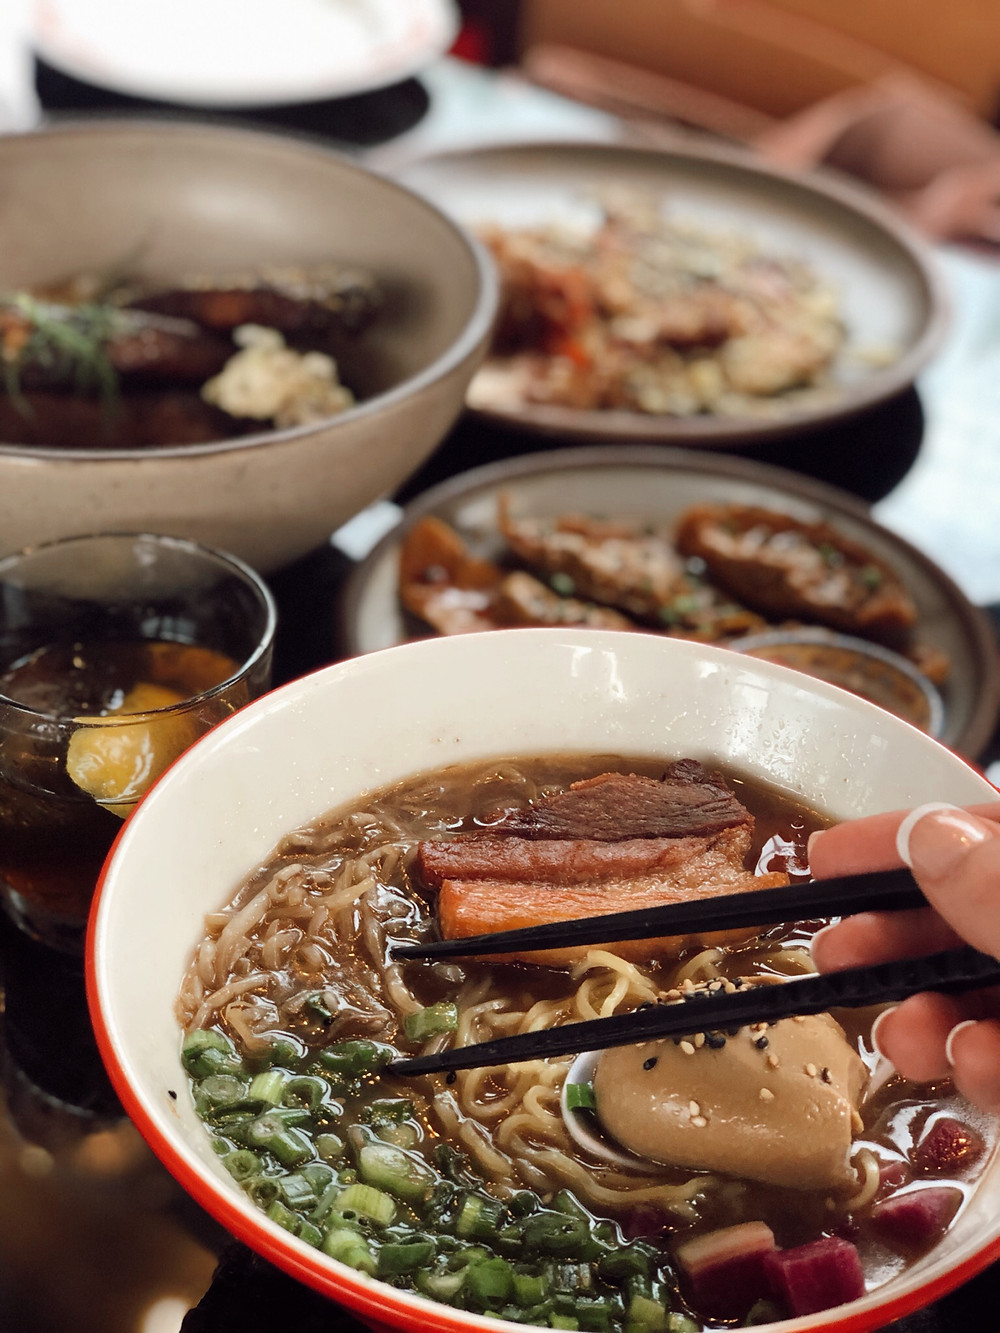 Gan Shan Station, Asheville restaurant, pork ramen bowl, Asian food and fare, Visit Asheville, local favorite